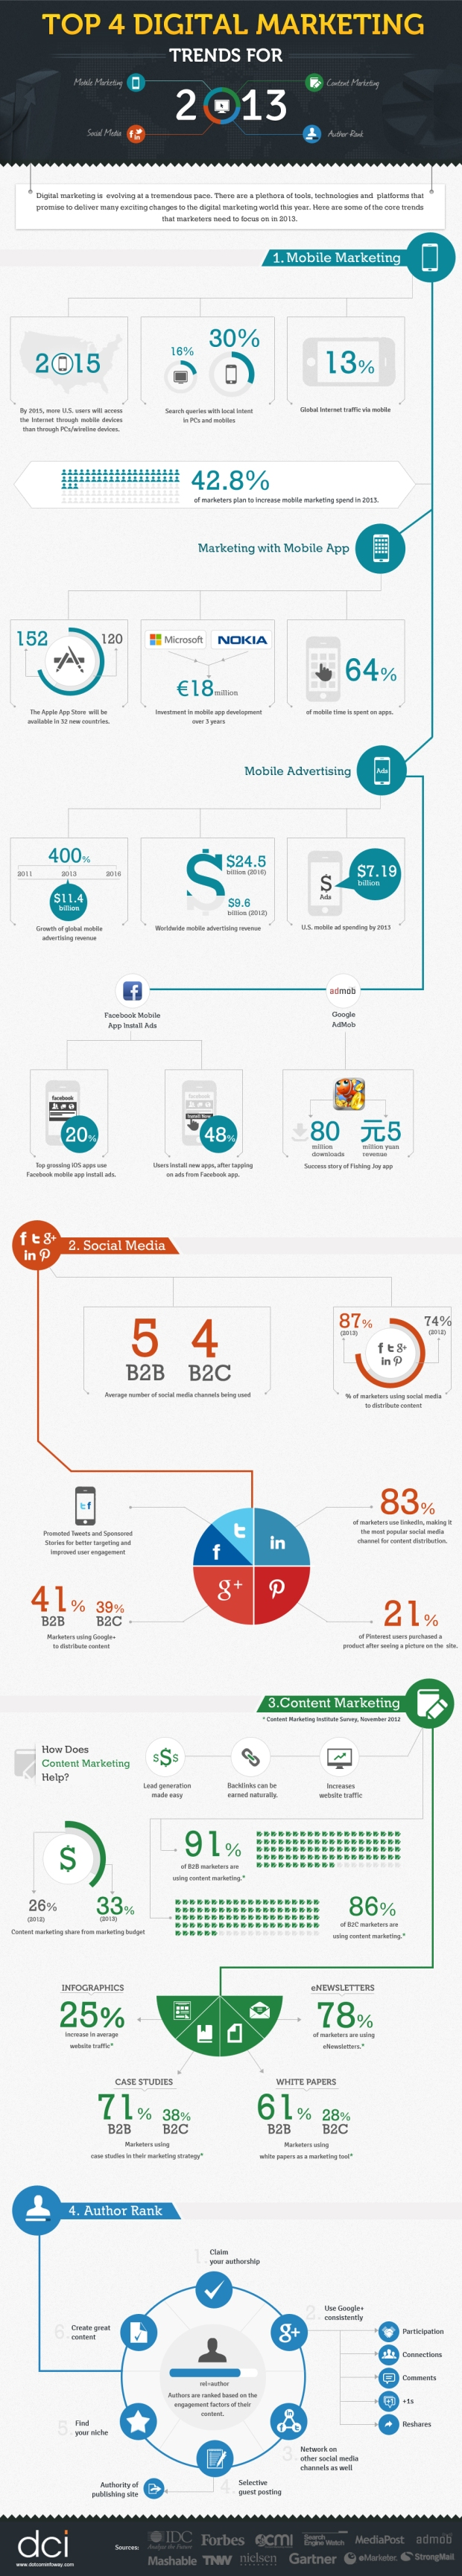 1digital-marketing-trends-2013-infographics